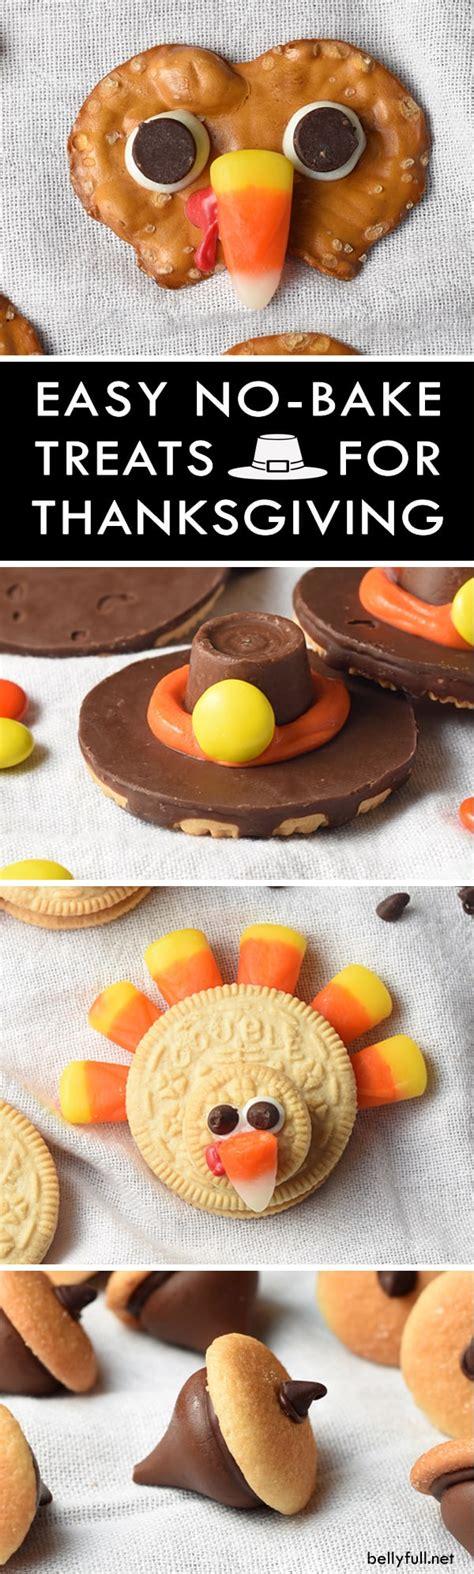 easy to bake new year goodies no bake turkey cookies